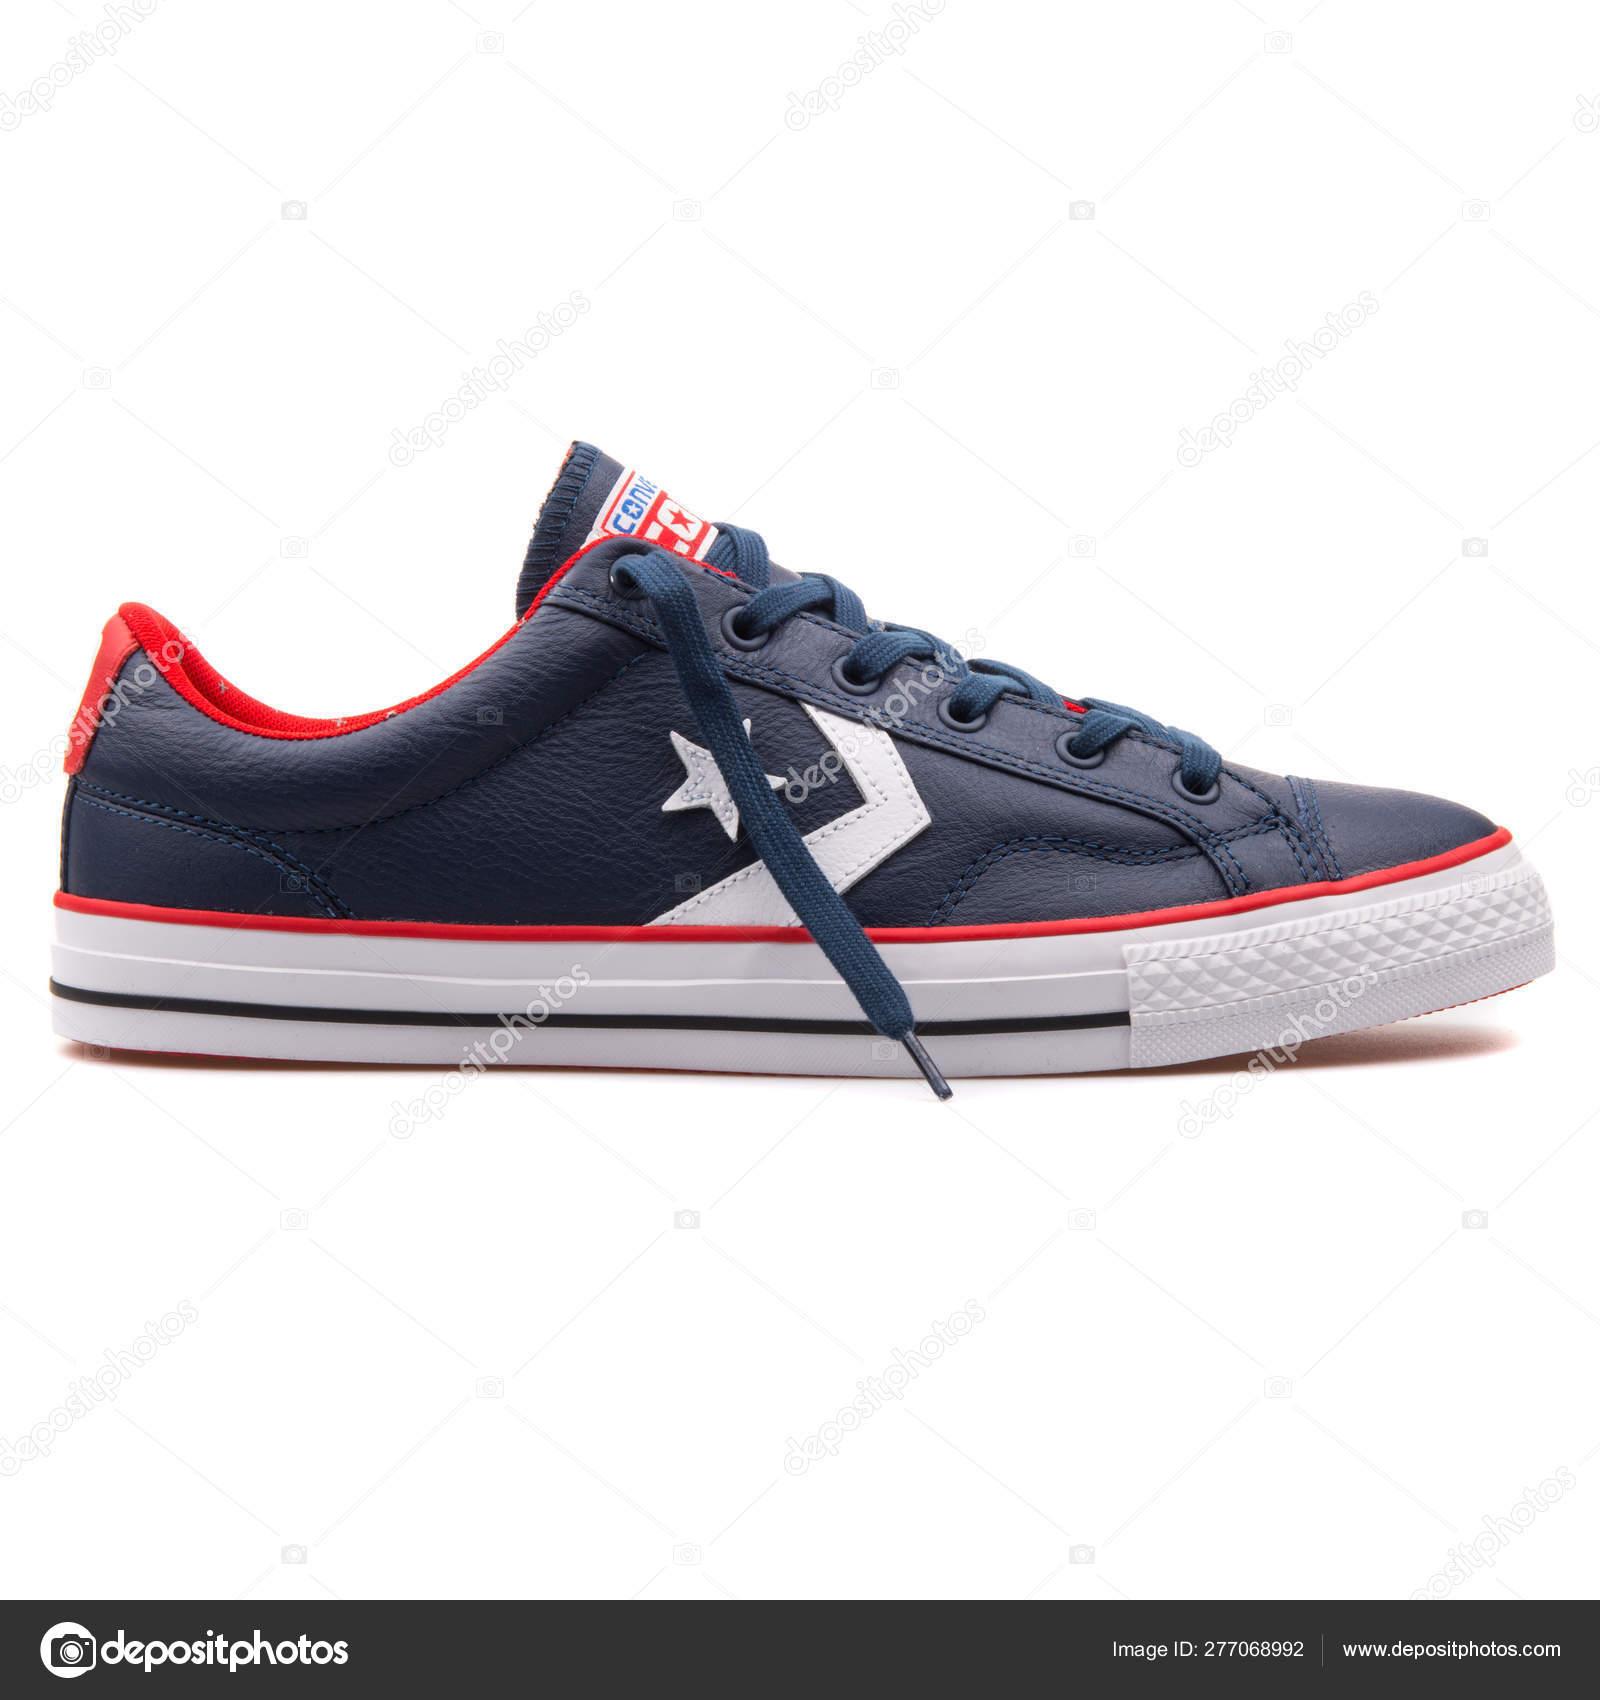 Converse Star Player OX navy blue